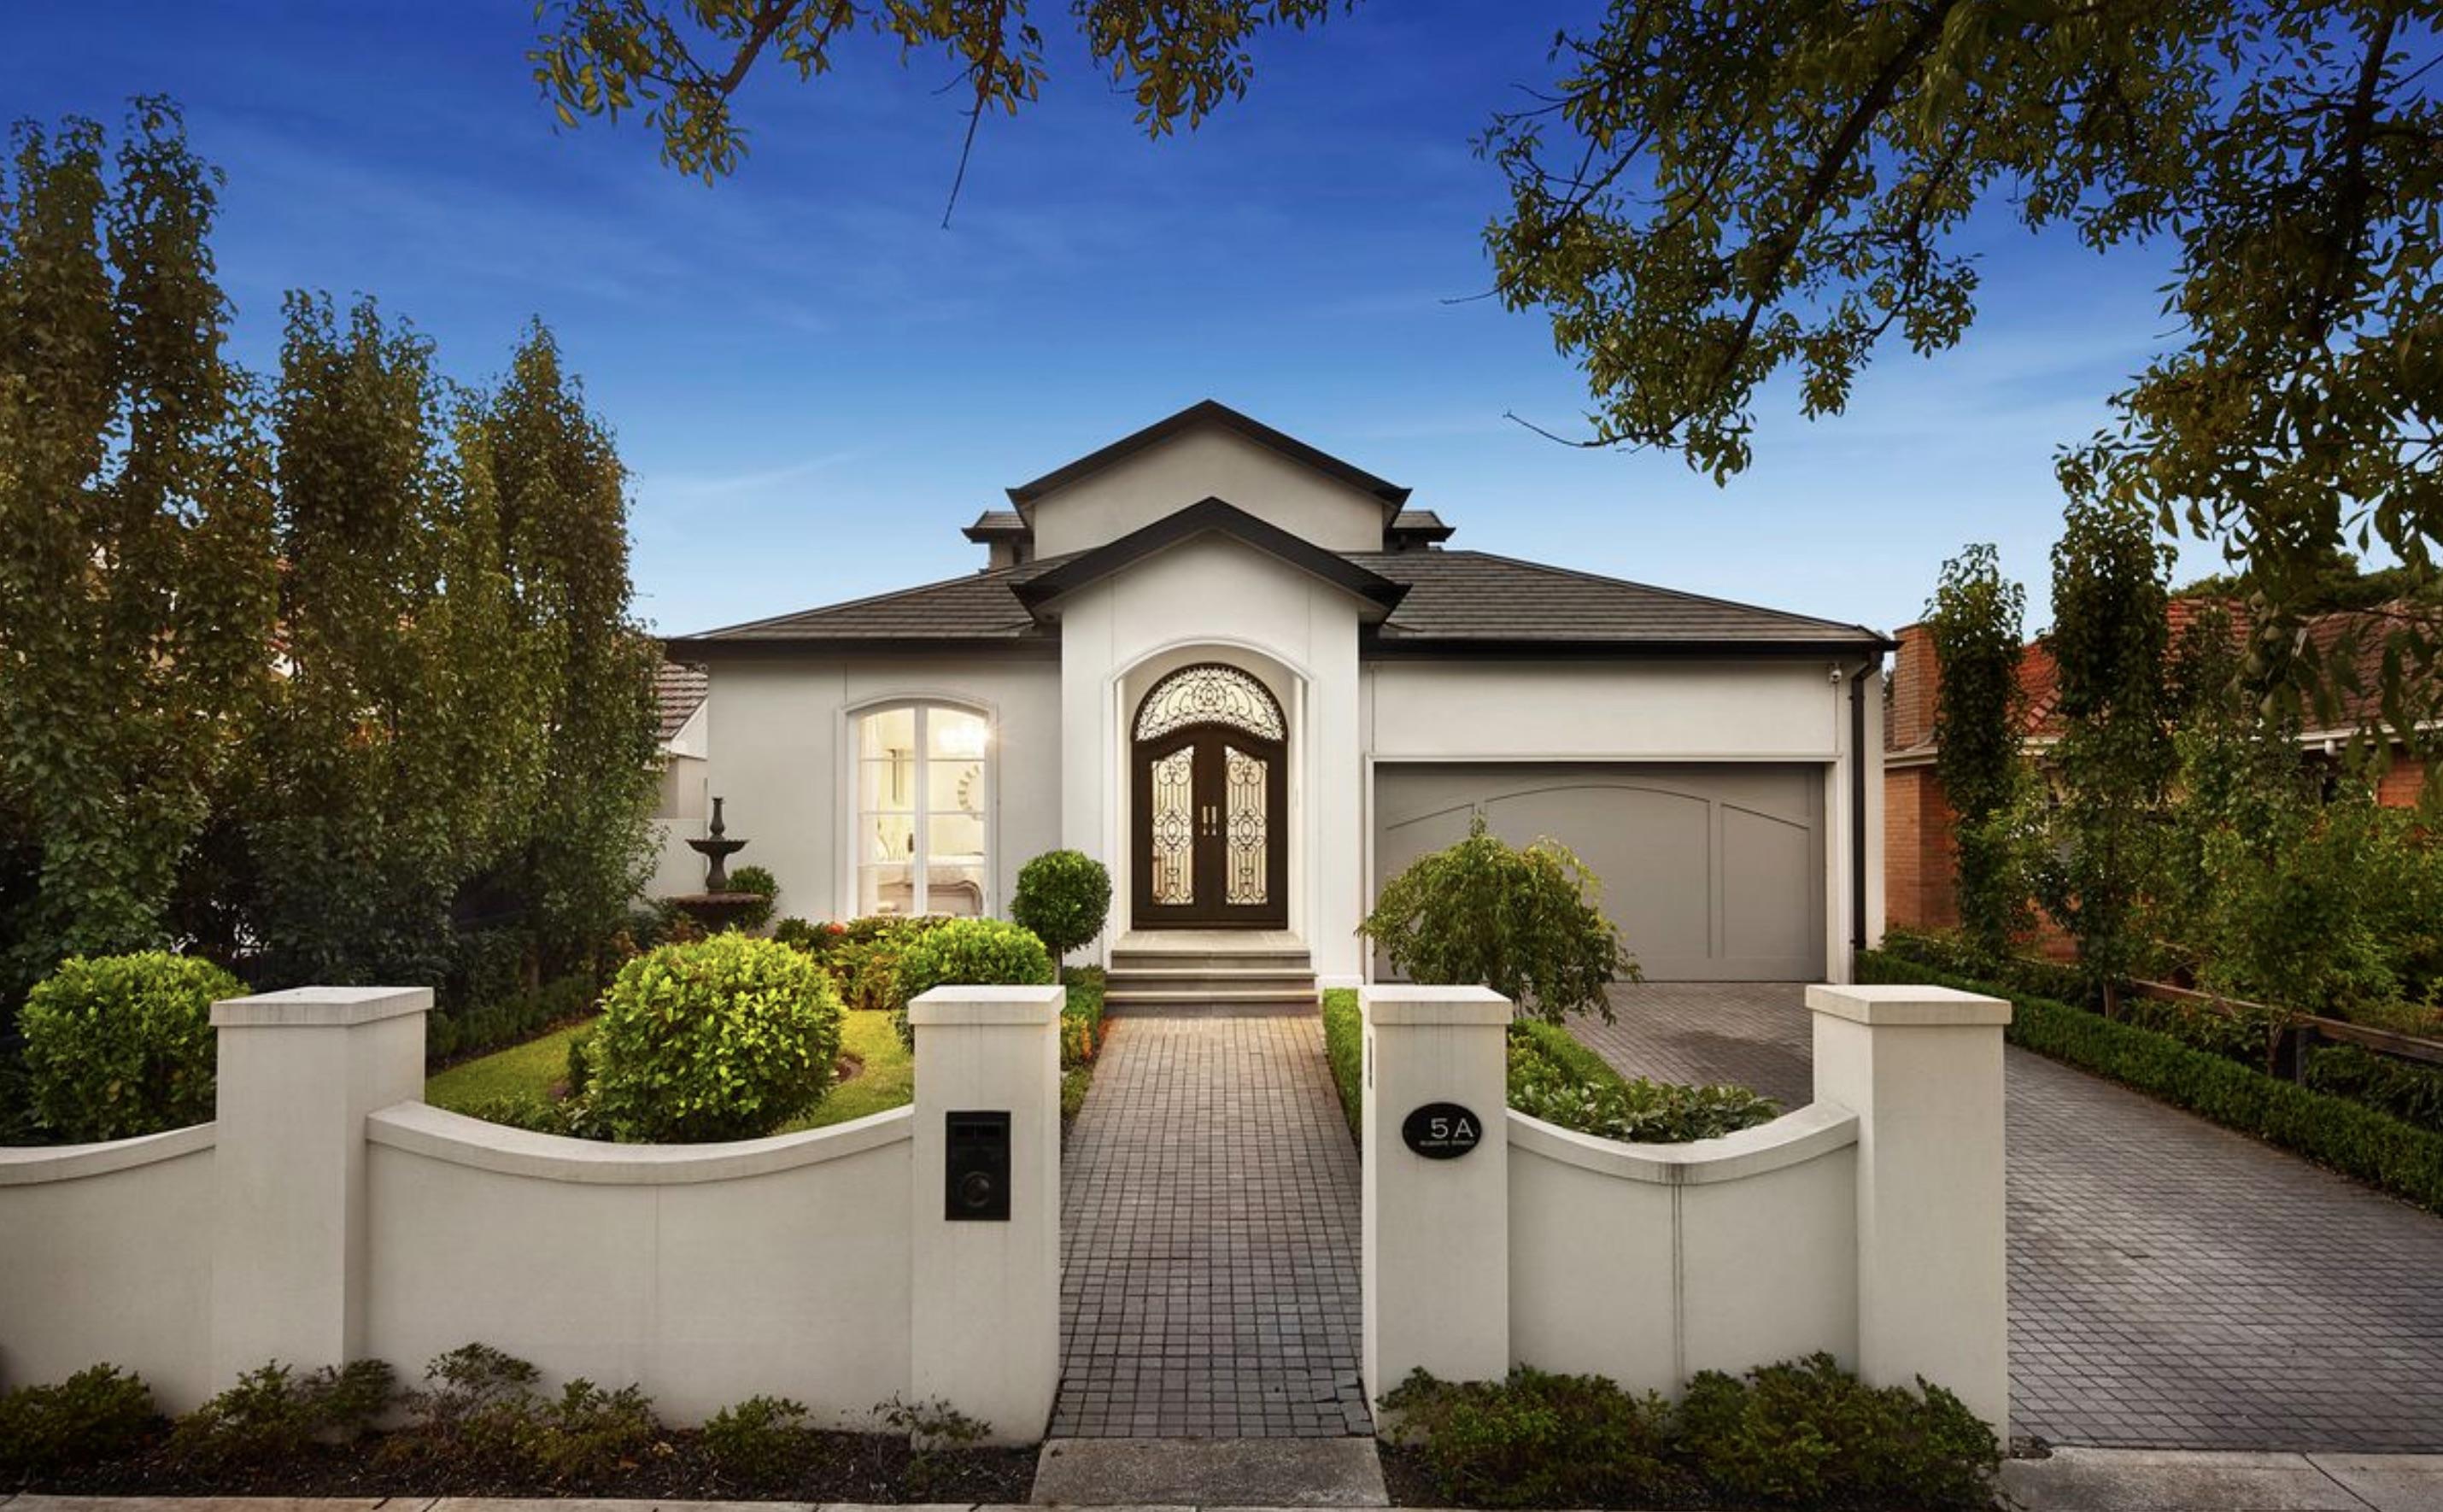 Rental Properties Essendon   Increase Rental Return Without